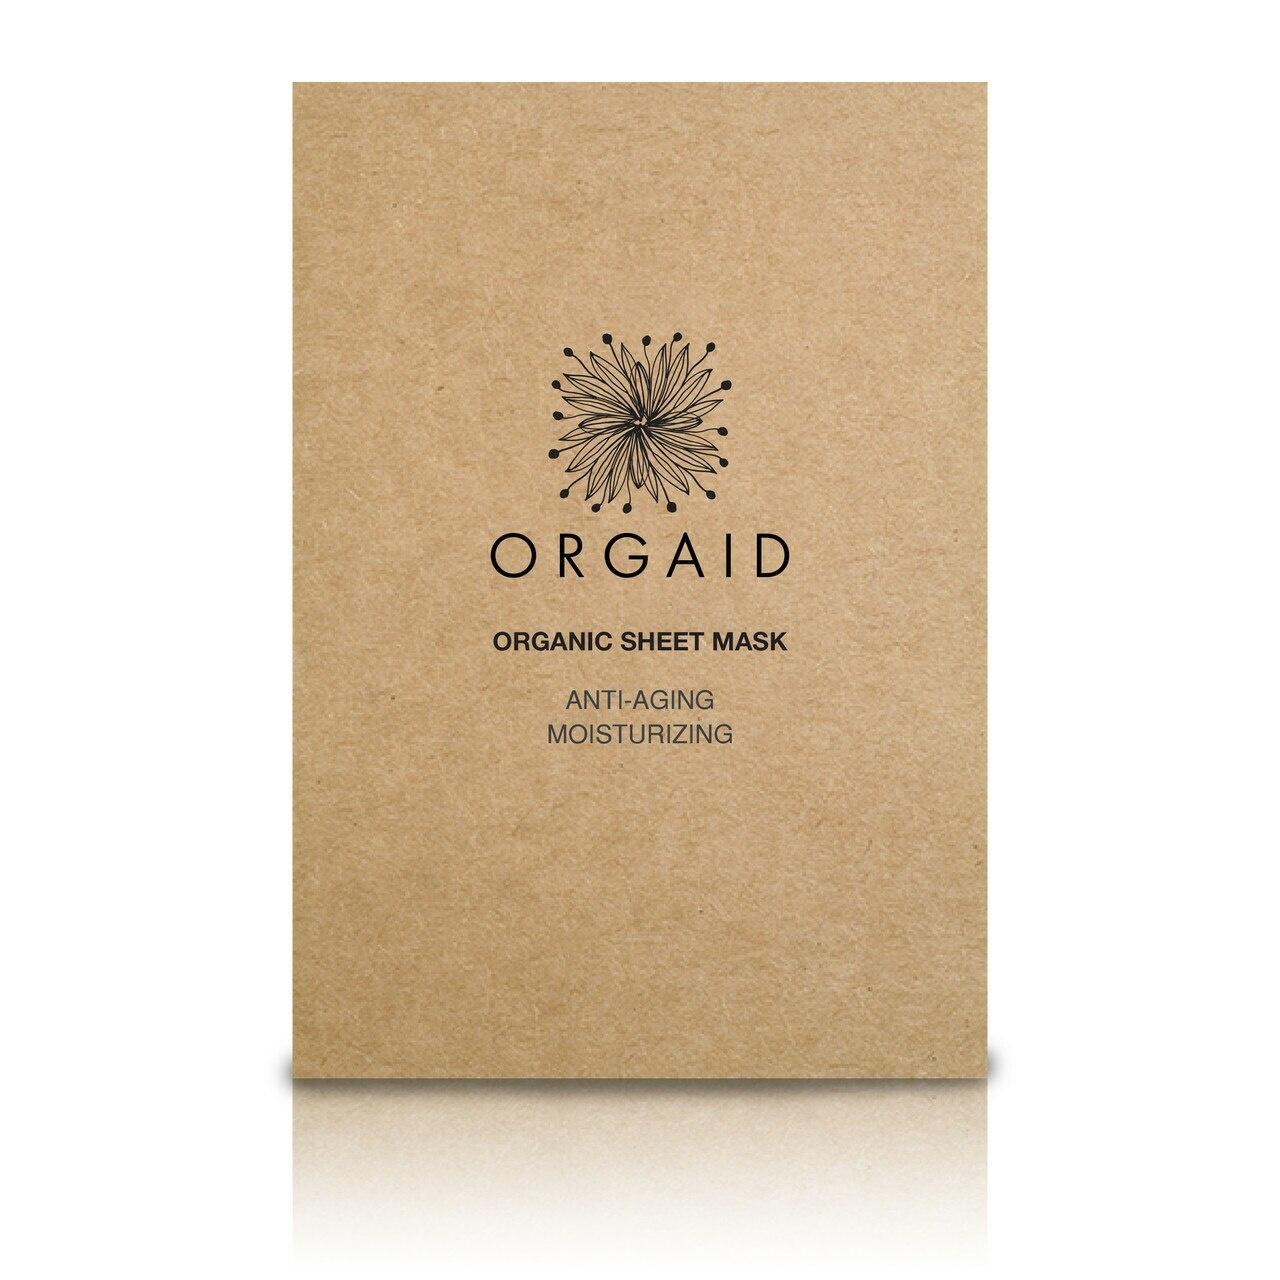 Anti-Aging & Moisturizing Organic Sheet Mask-1